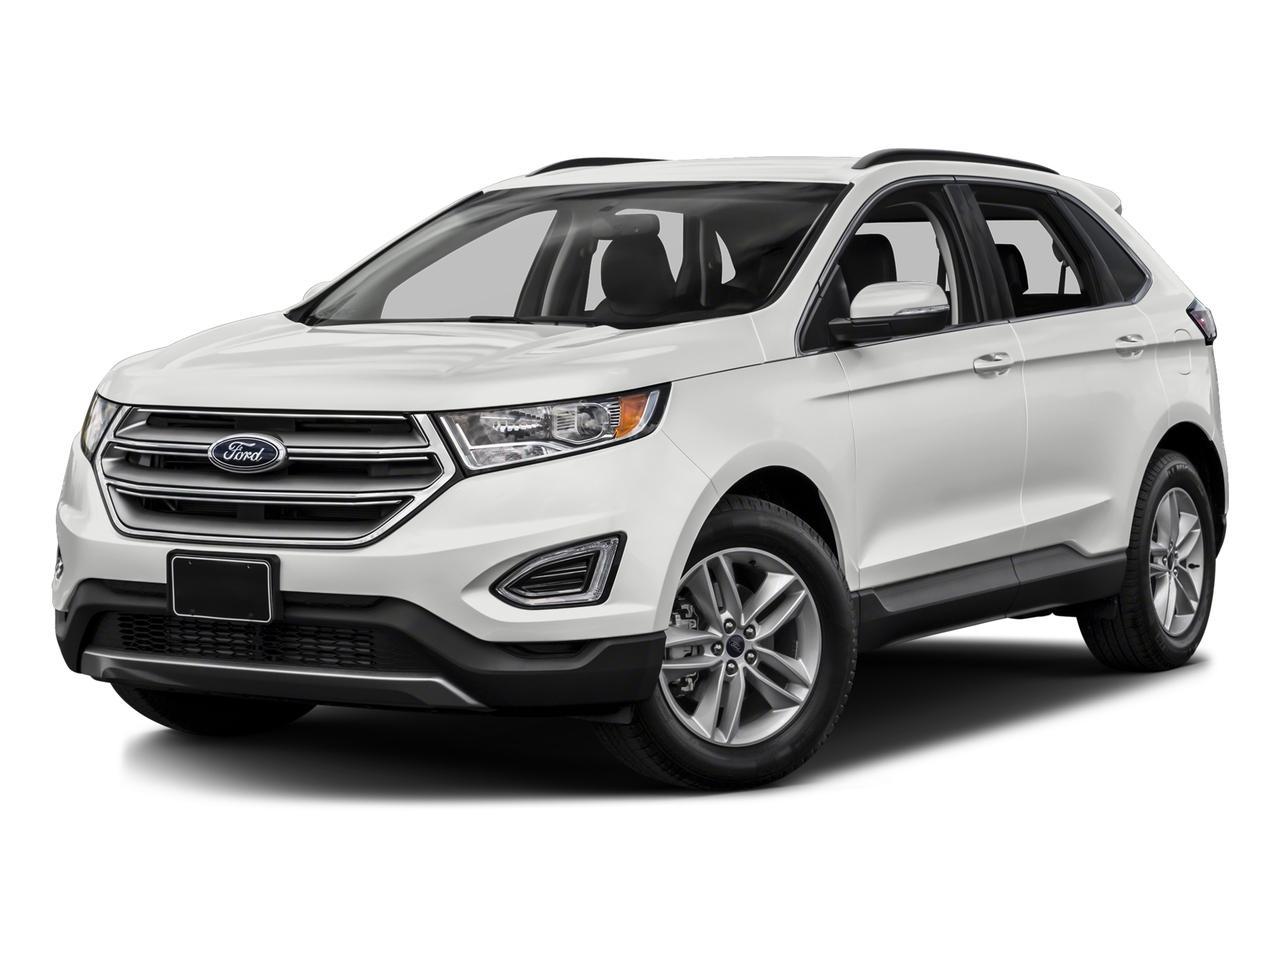 2017 Ford Edge Vehicle Photo in Easley, SC 29640